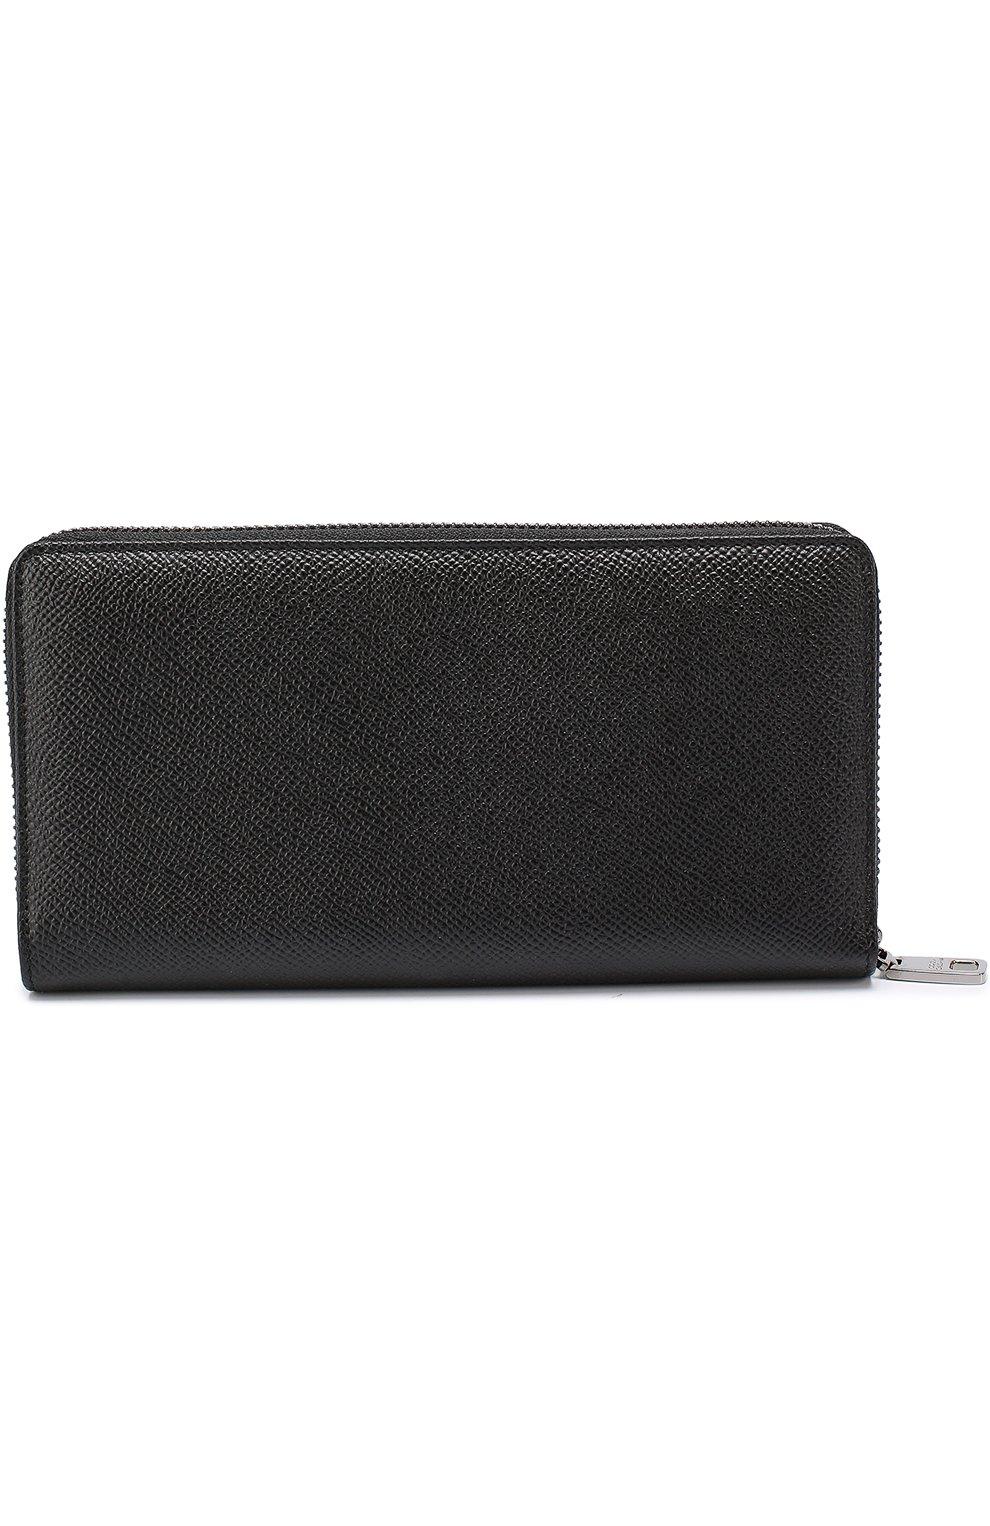 Кожаное портмоне Dolce & Gabbana черного цвета | Фото №2